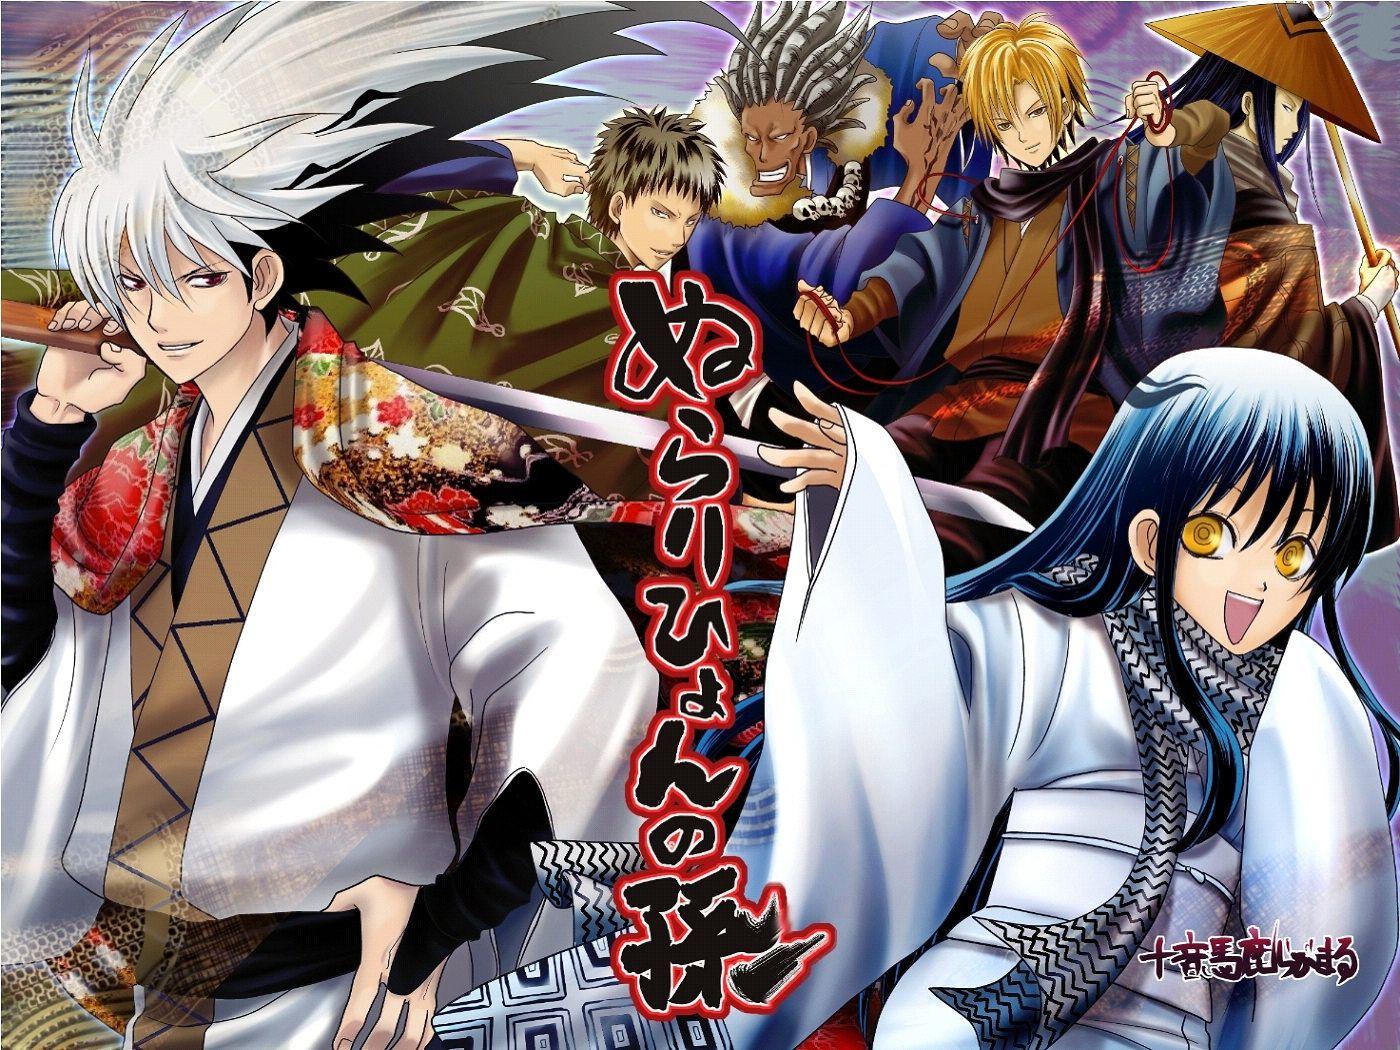 Nurarihyon No Mago Wallpapers Wallpaper With Images Anime